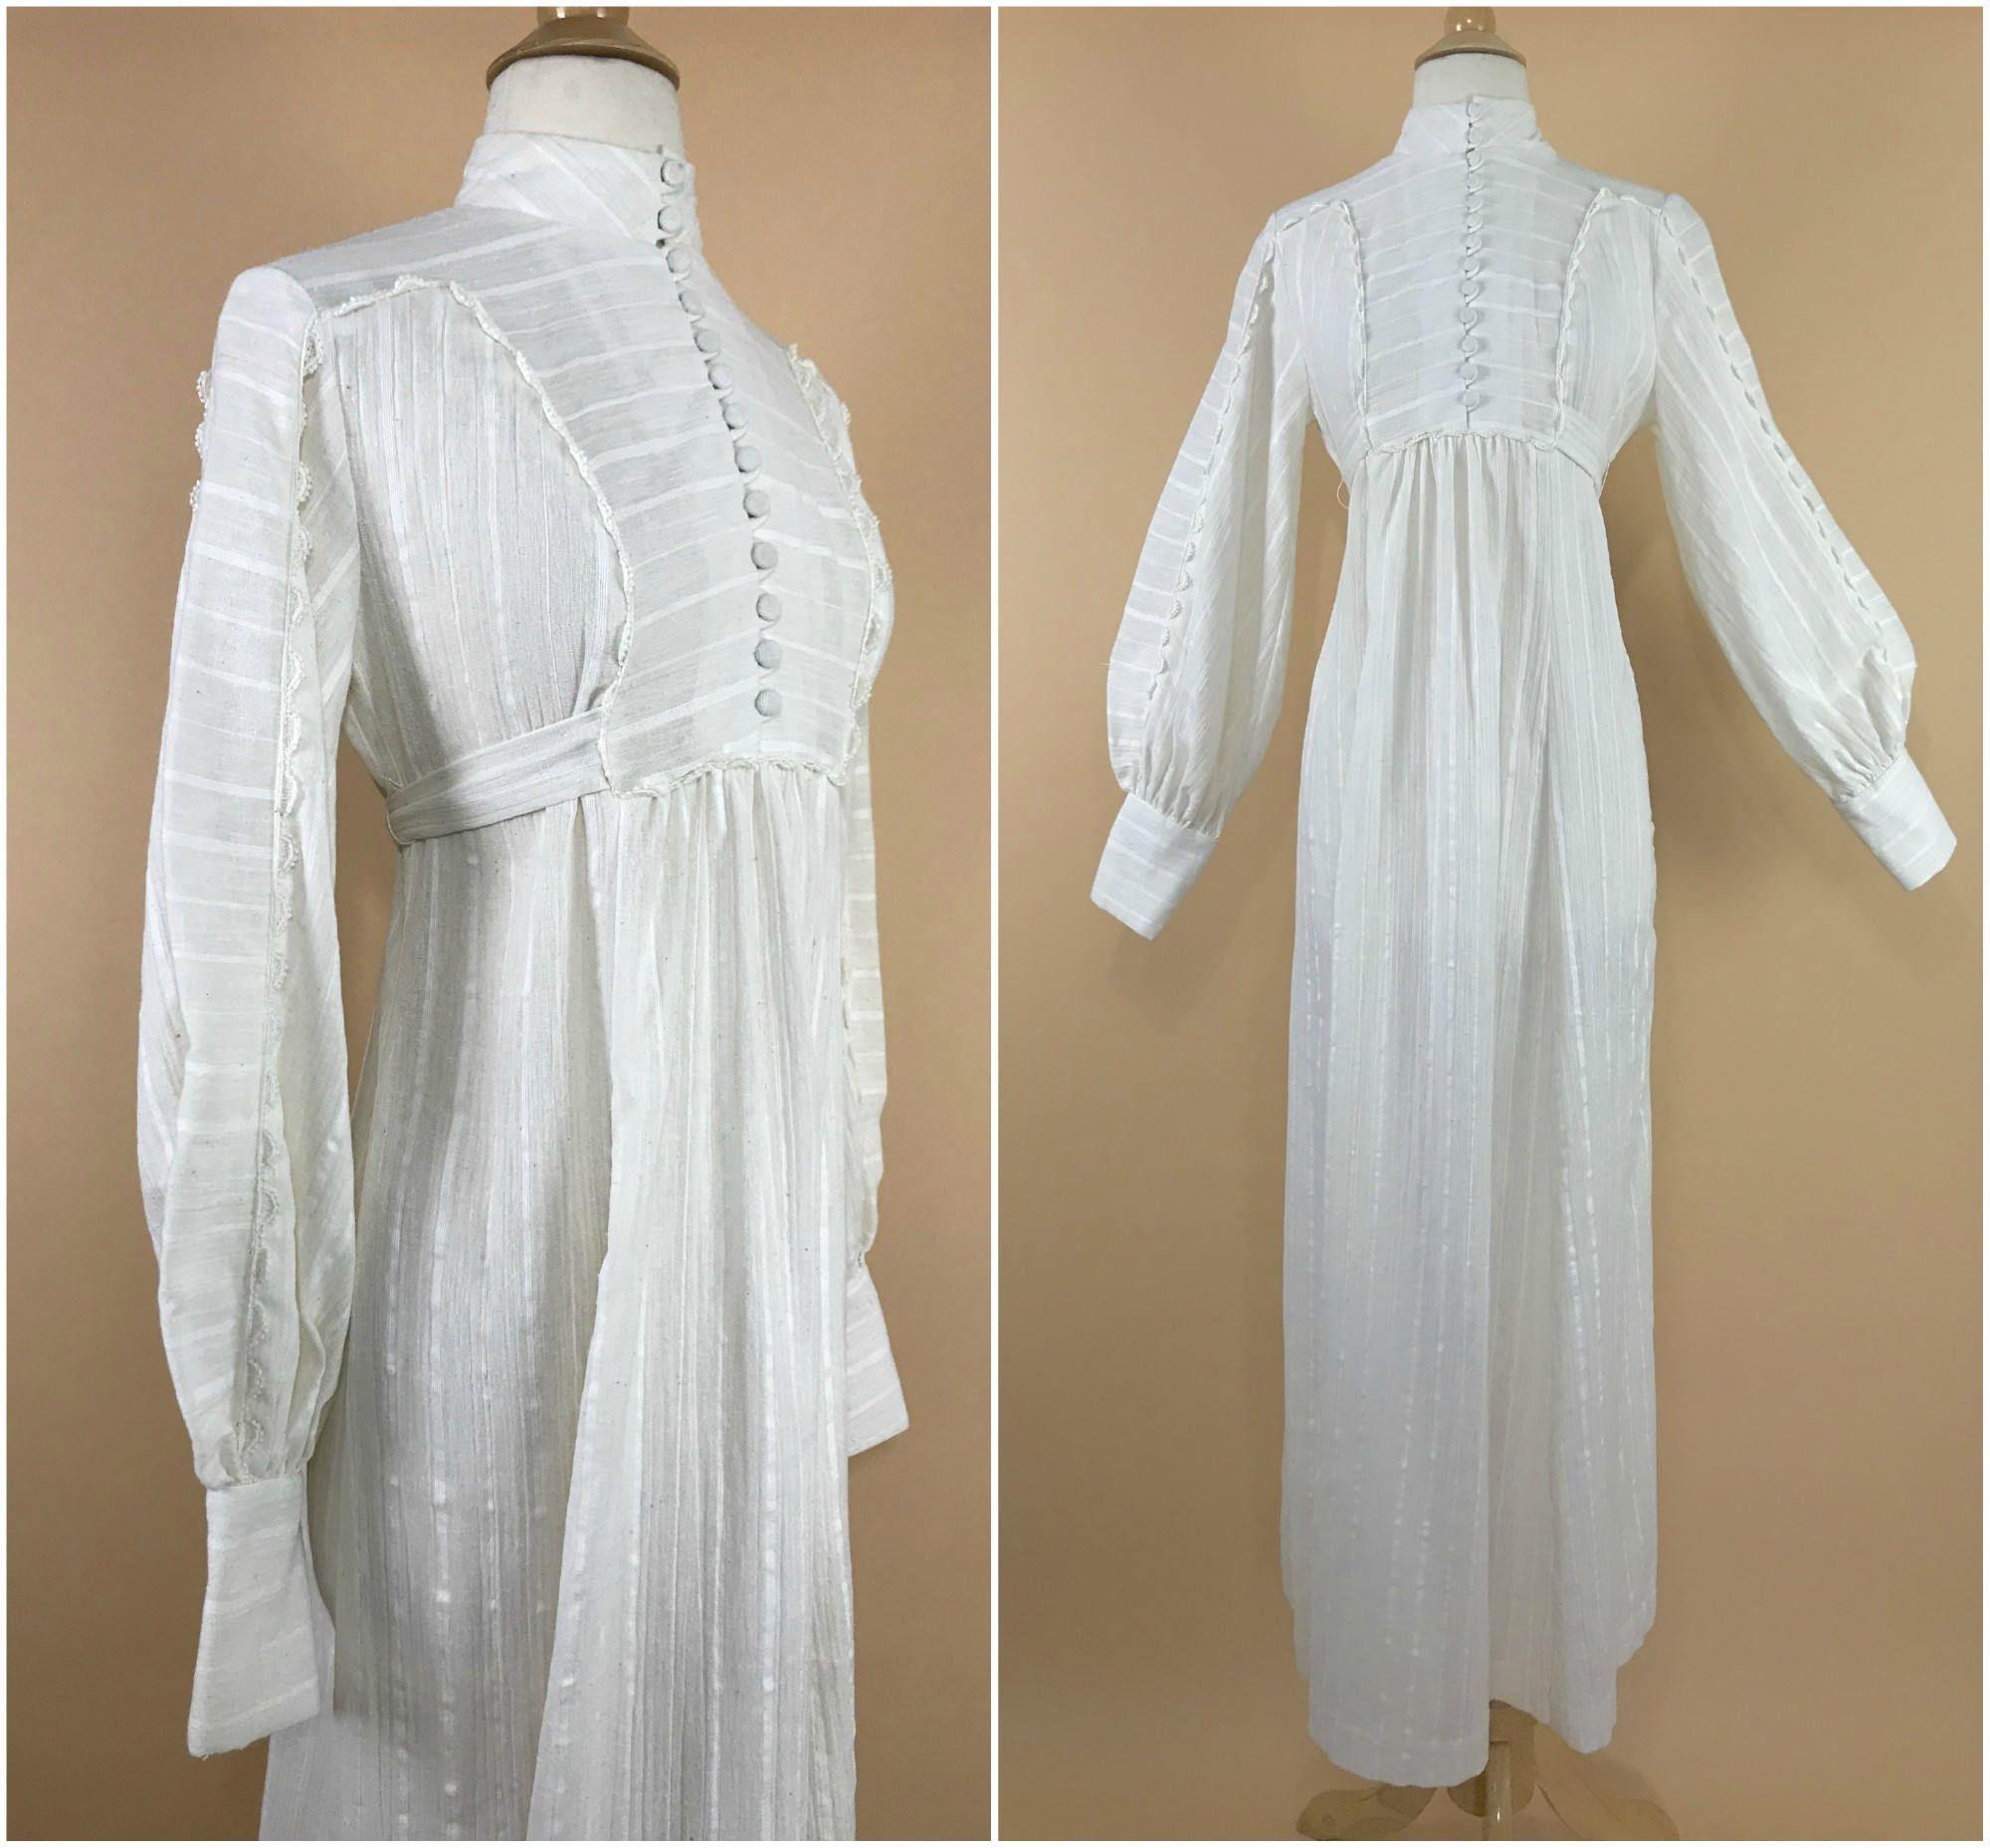 1970s Prairie Dress Empire Waist Vintage Victorian Dress White Gauze Maxi Dress 70s Peasant Dress Edwardian Pioneer Dress Bishop Sleeves Gauze Maxi Dress Pioneer Dress Prairie Dress [ 1857 x 2000 Pixel ]